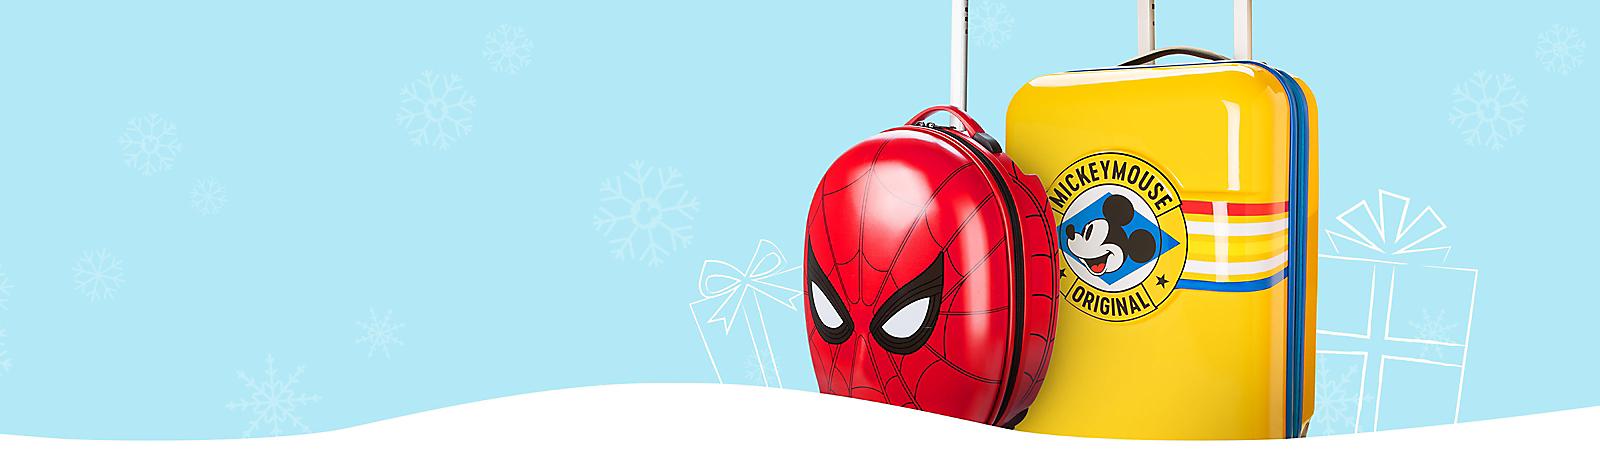 Kids' Luggage & Travel